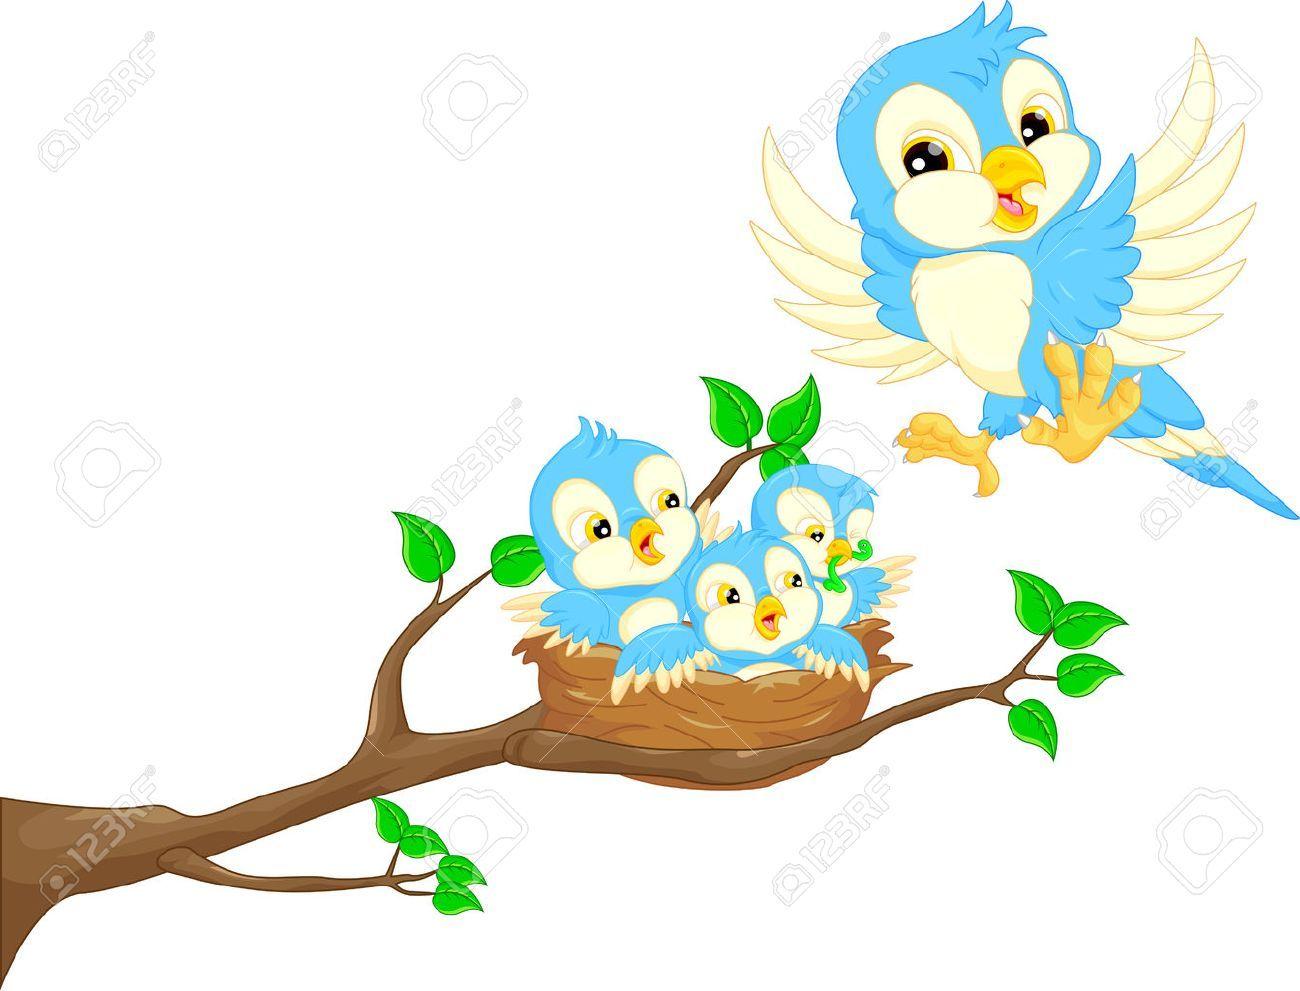 Baby bird in nest clipart 5 » Clipart Portal.